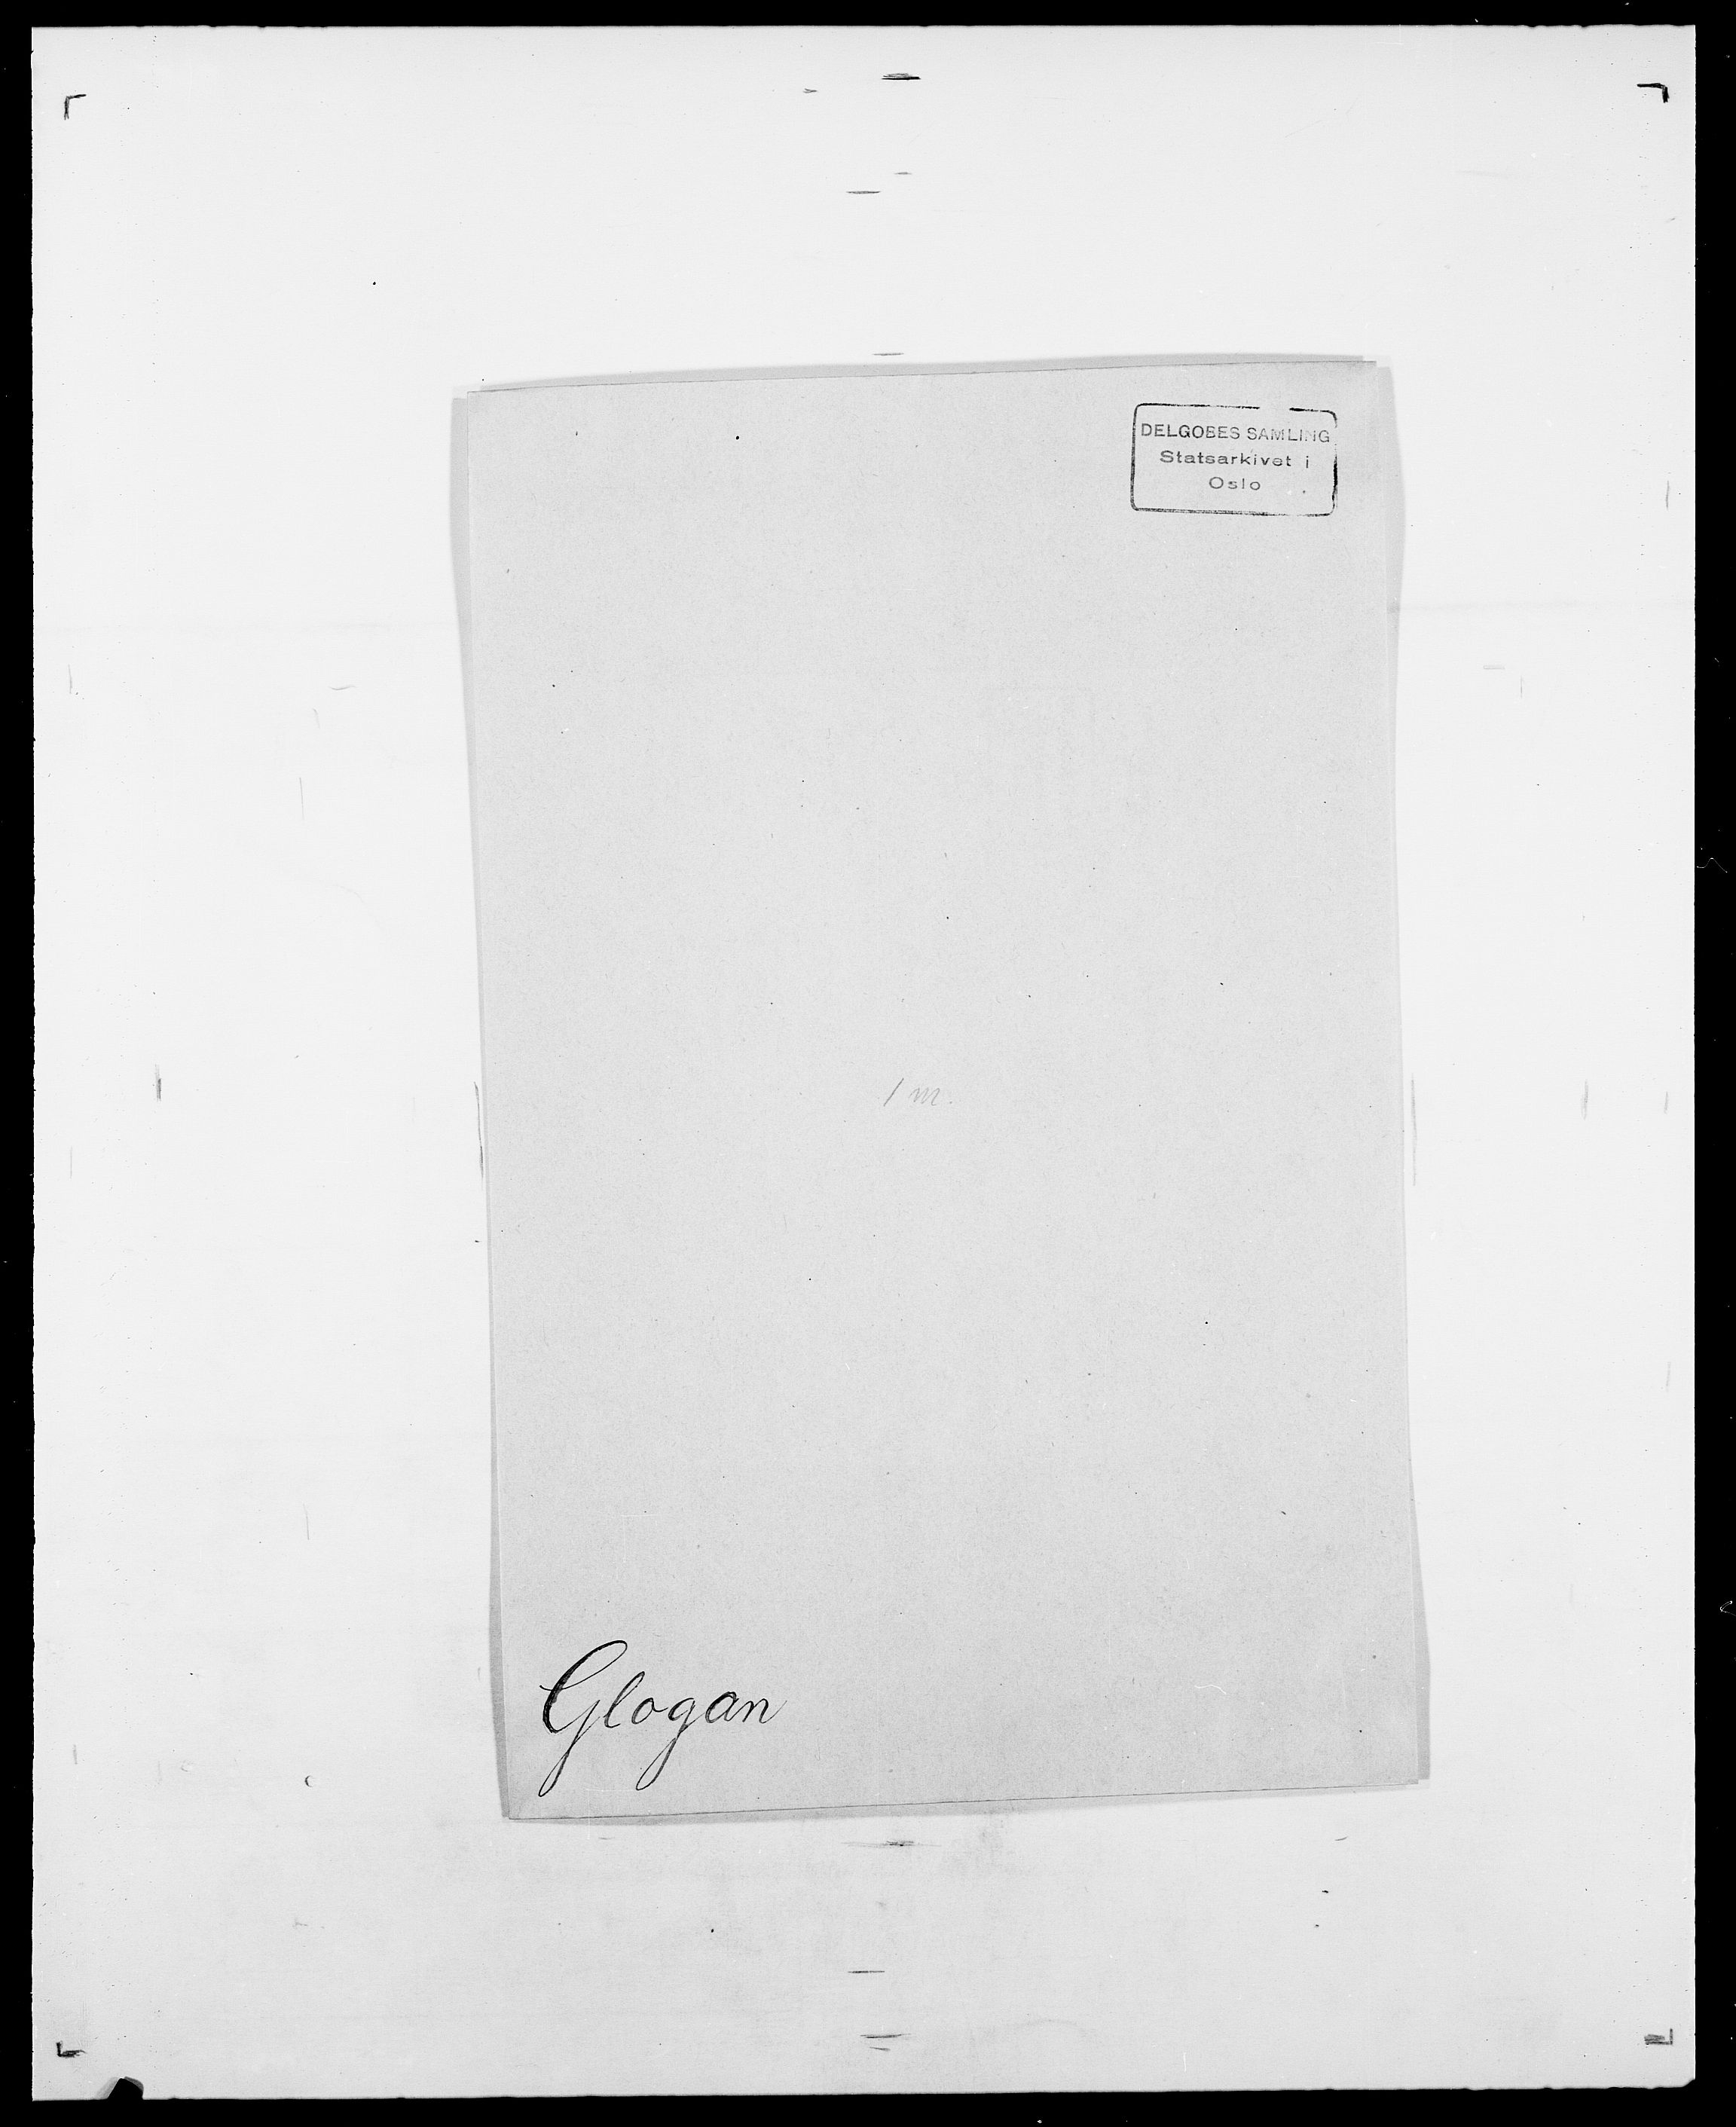 SAO, Delgobe, Charles Antoine - samling, D/Da/L0014: Giebdhausen - Grip, s. 325